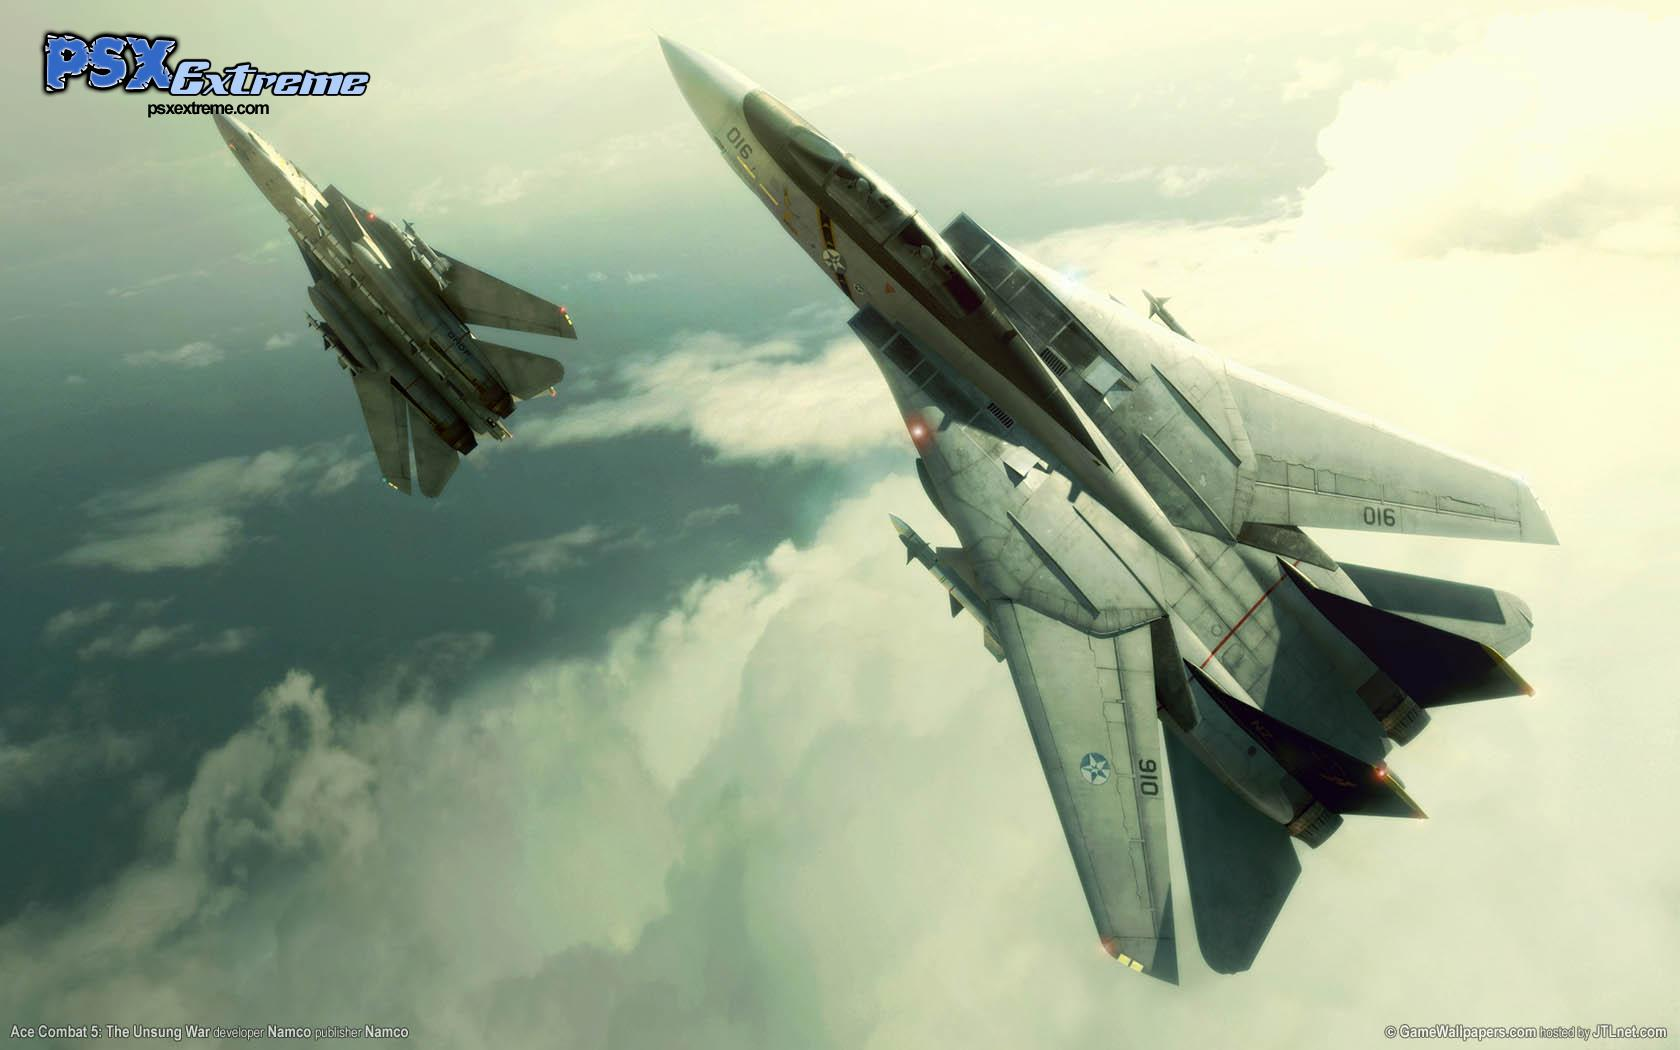 Ace Combat Wallpapers 1680x1050